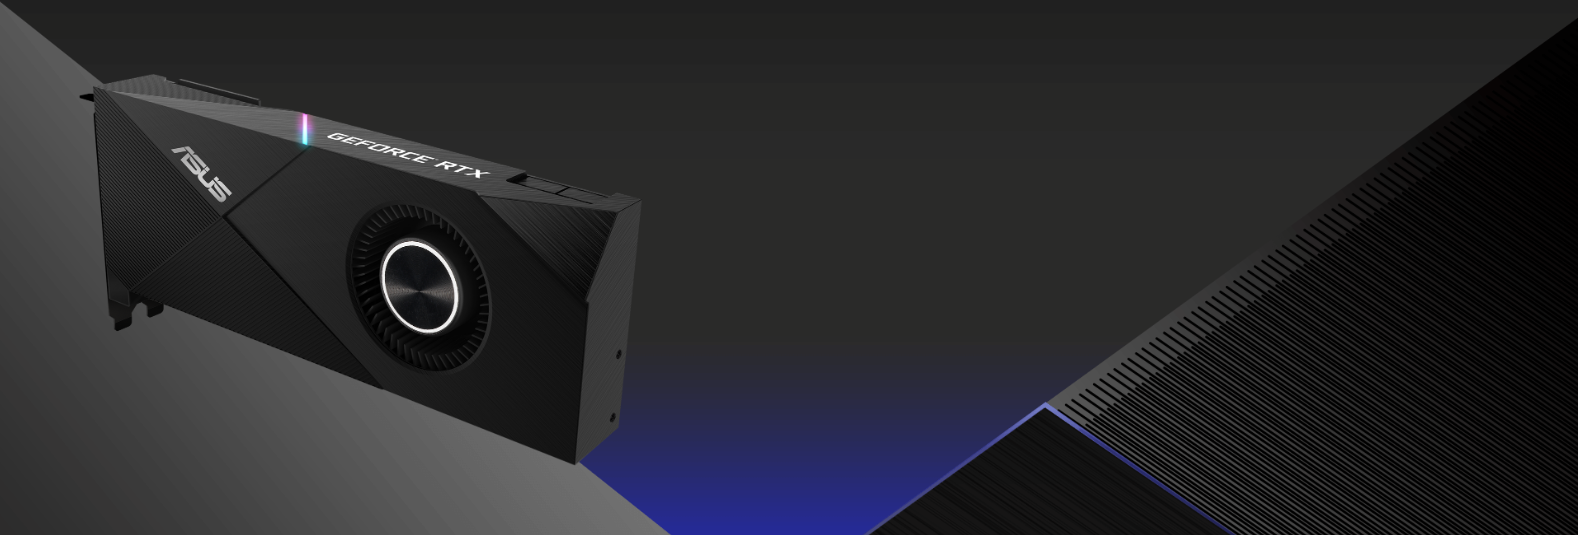 ASUS Turbo GeForce RTX 2080 EVO